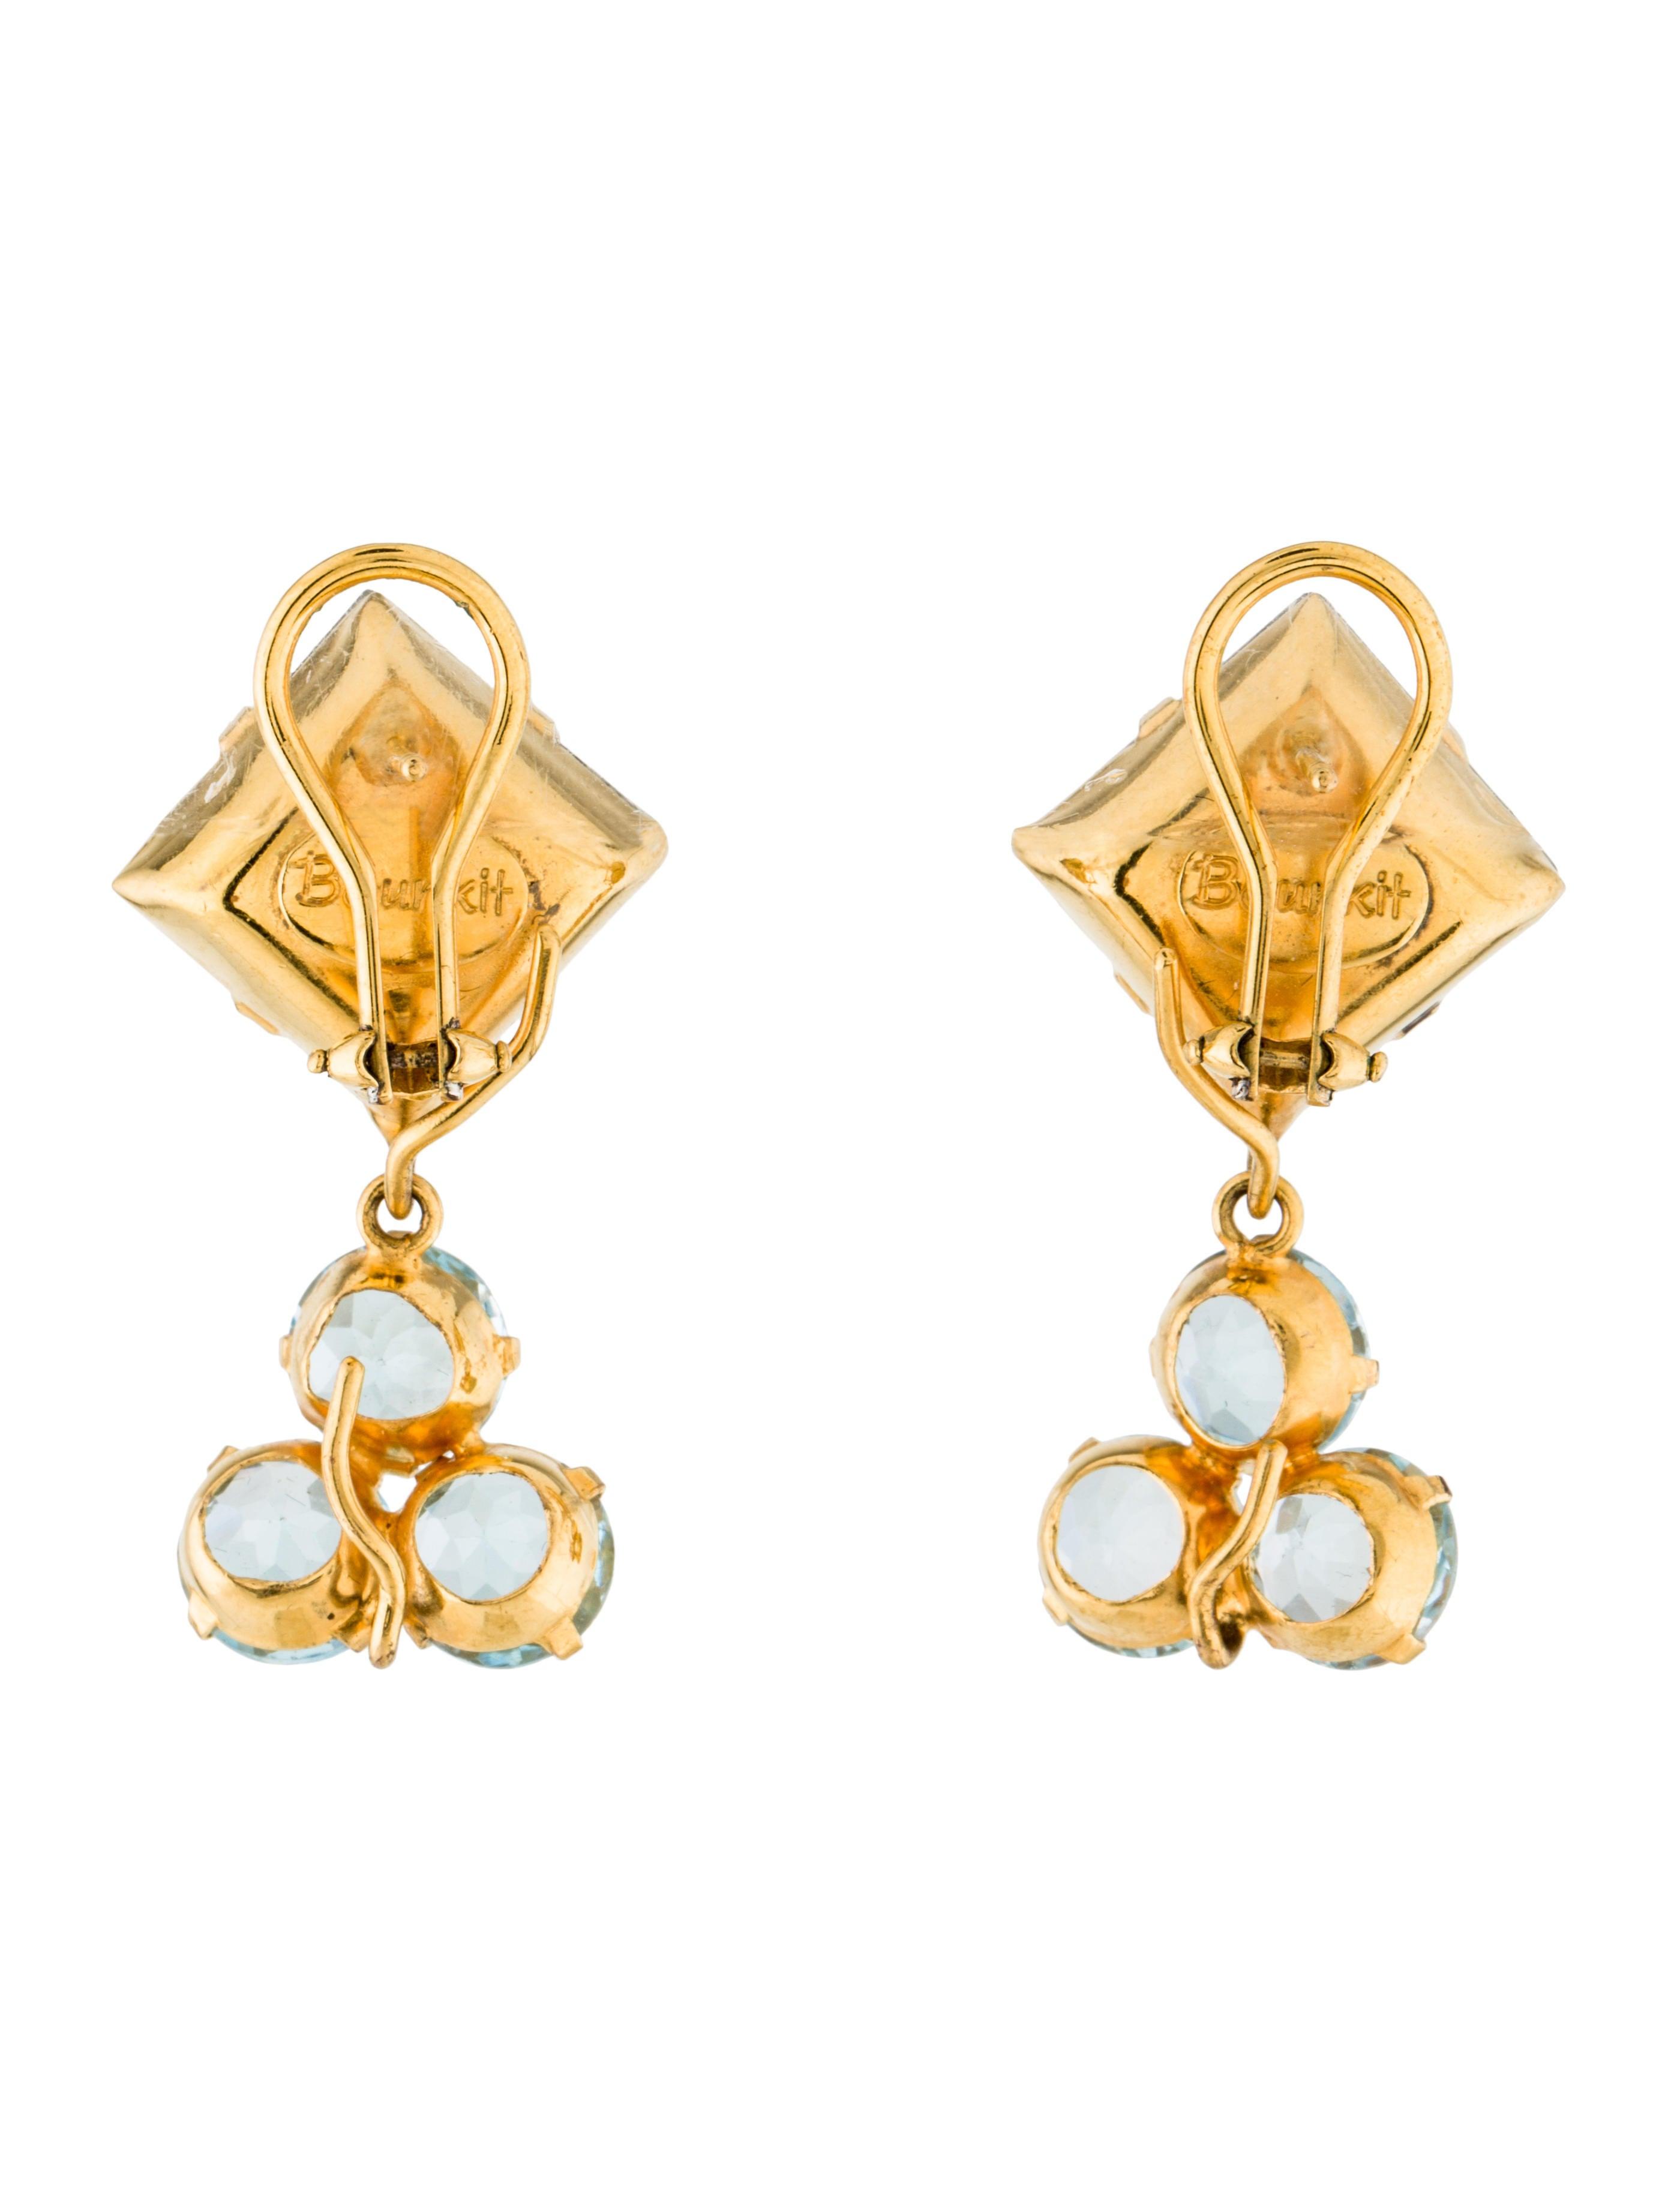 bounkit labradorite blue topaz earrings earrings. Black Bedroom Furniture Sets. Home Design Ideas